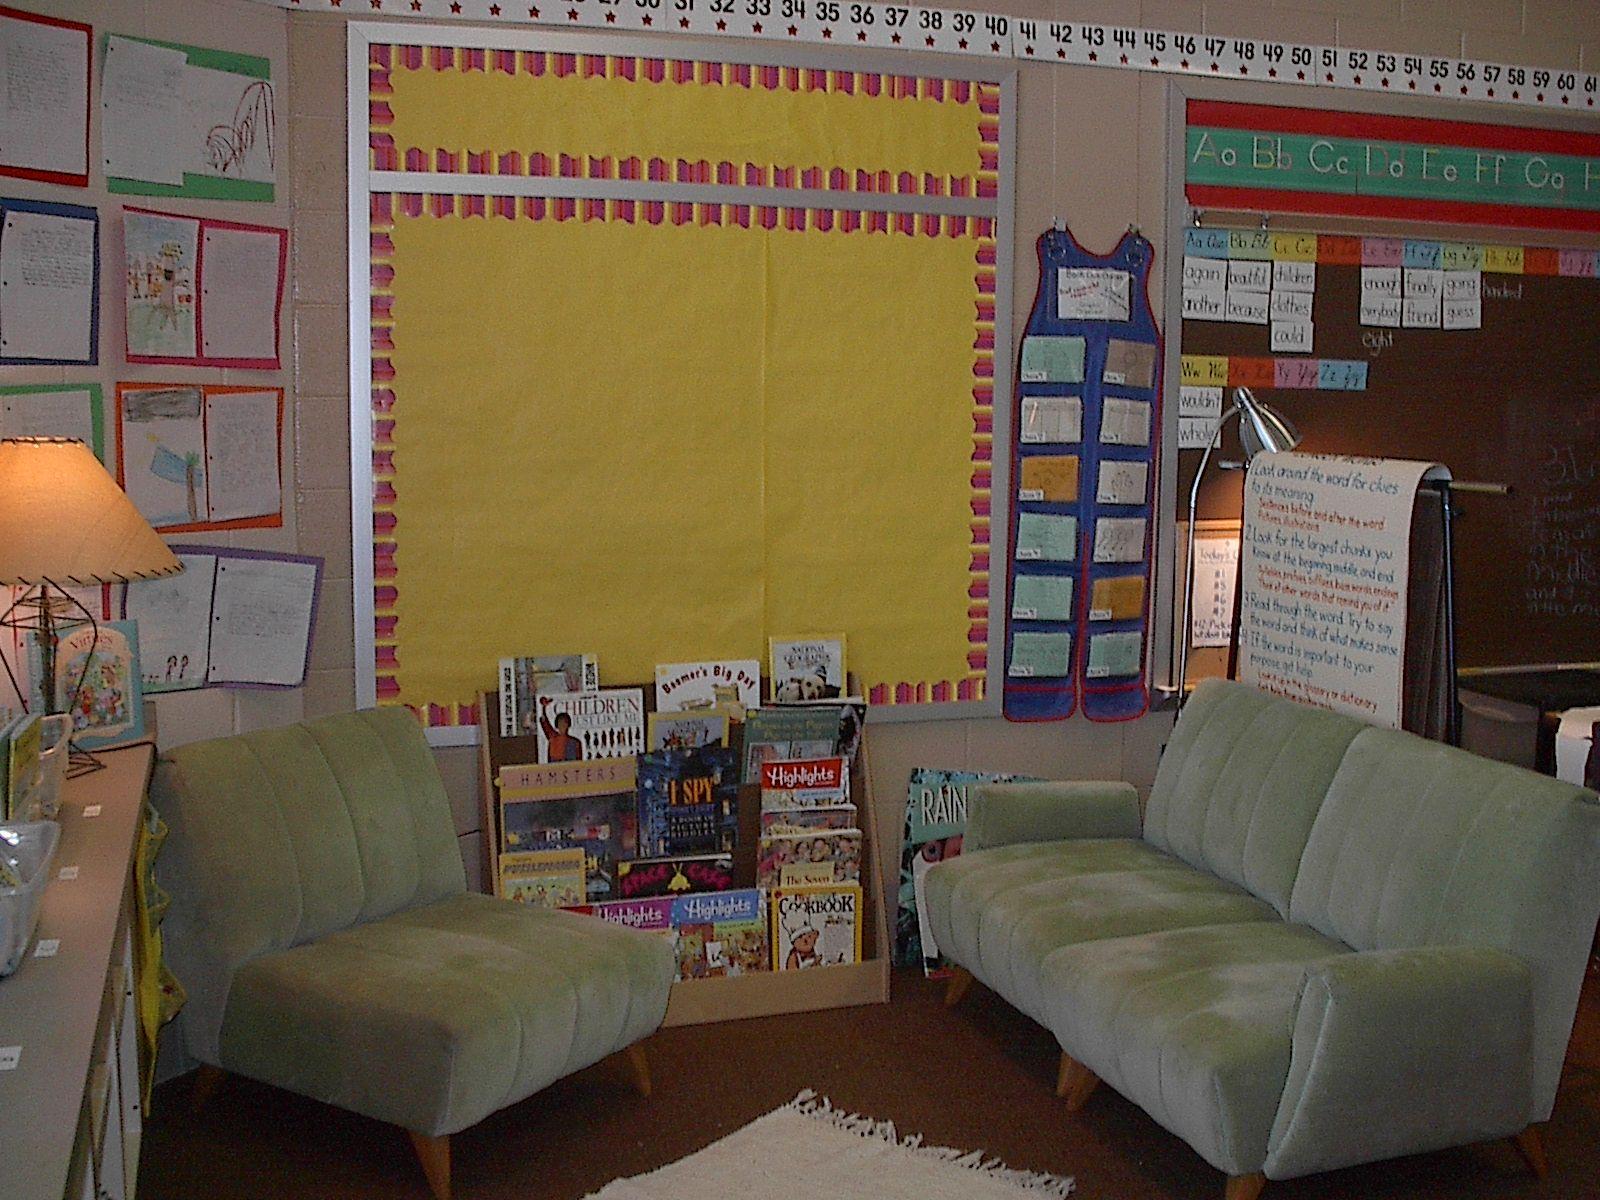 6th Grade Language Arts Classroom Decorations ~ Th grade classroom setup ideas room the school